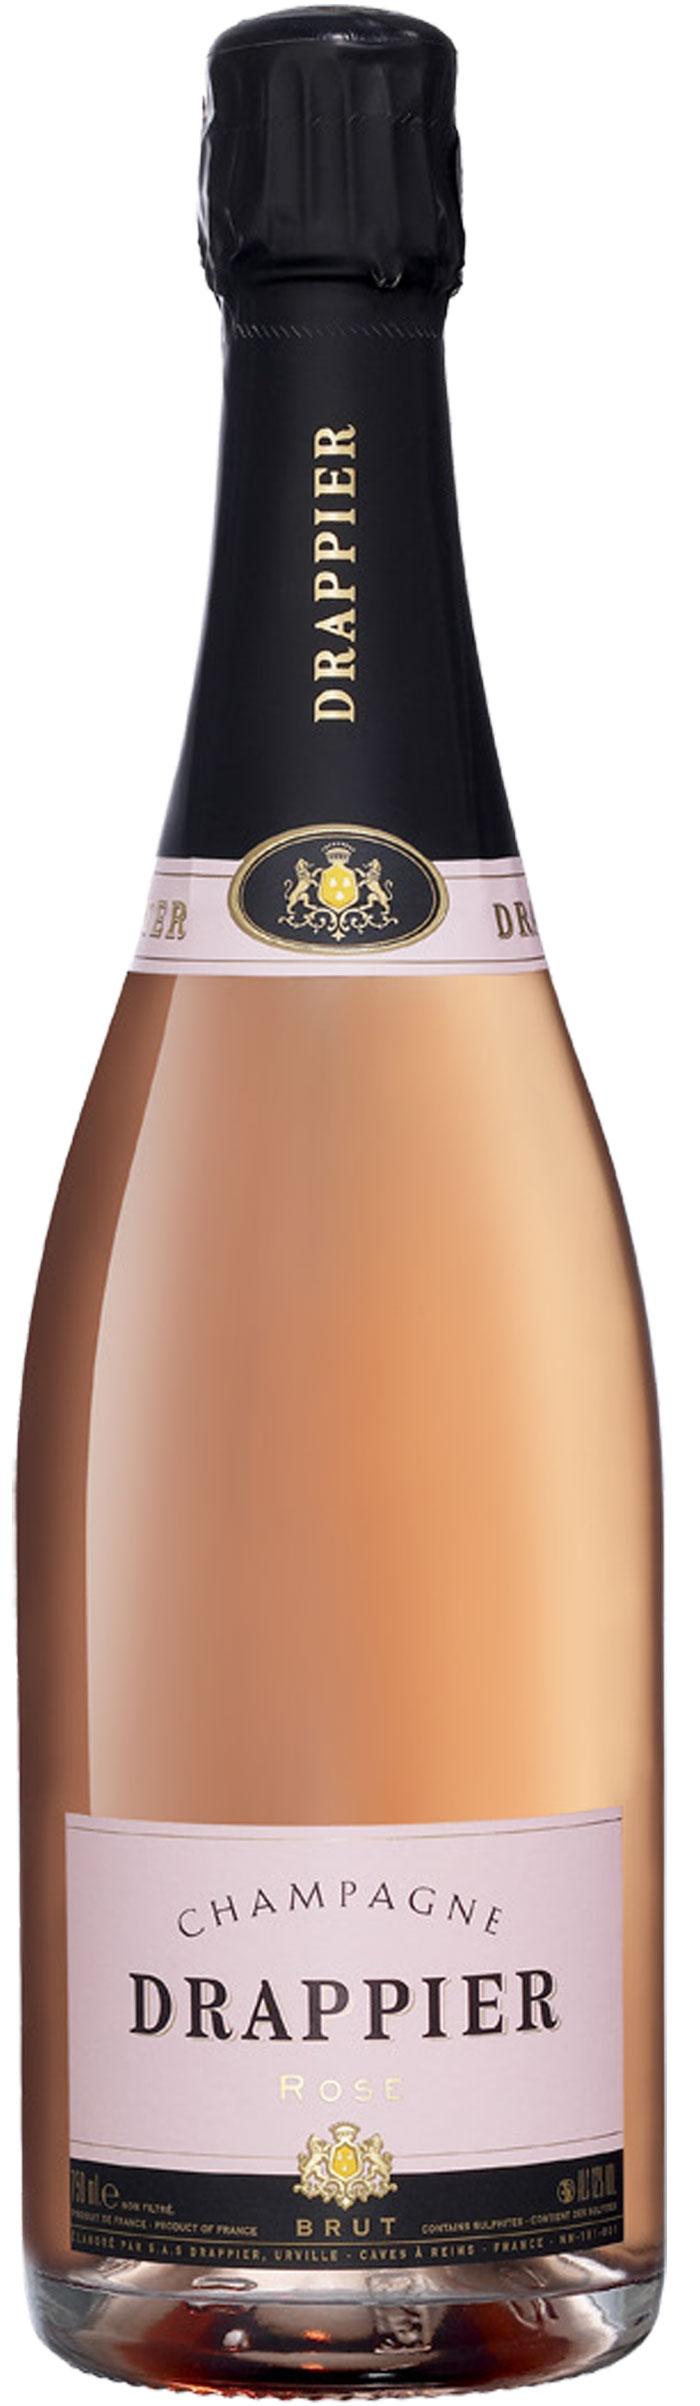 Drappier Rosé